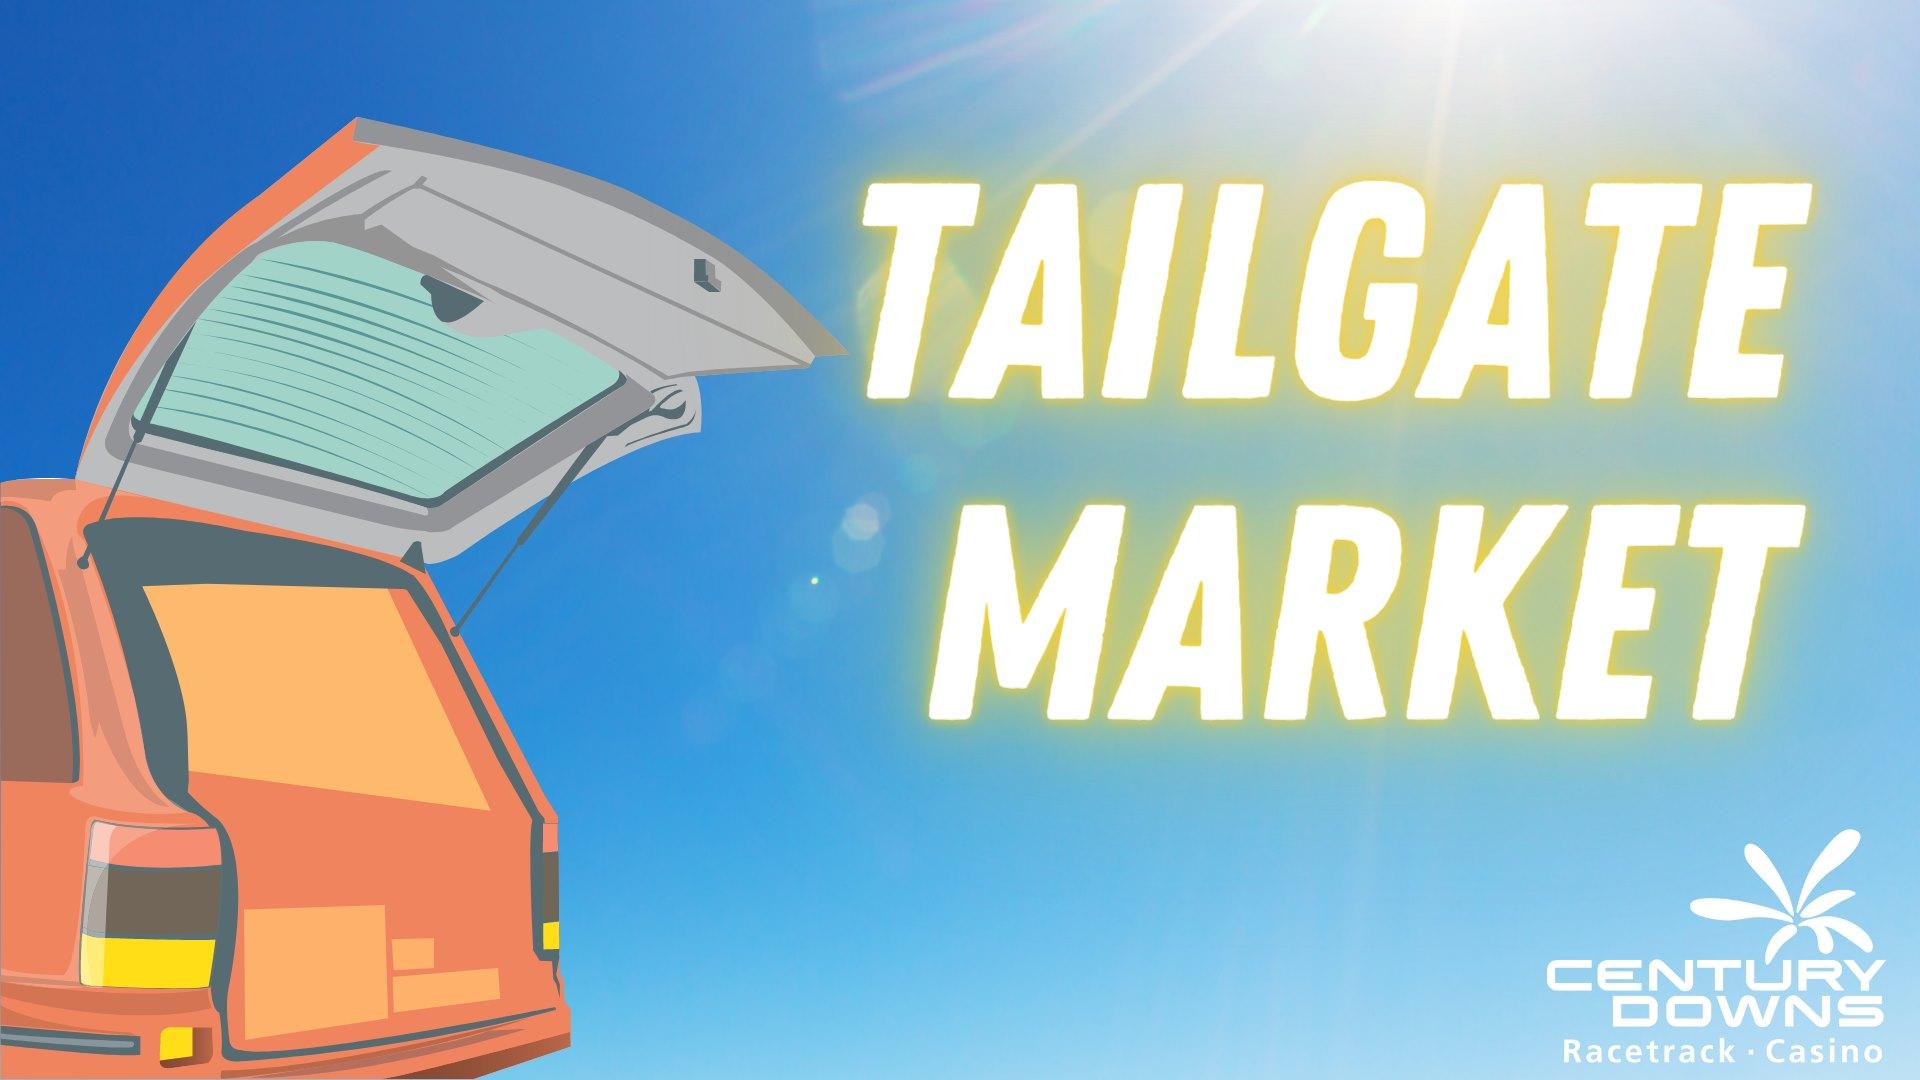 Century Downs Tailgate Market on Where Rockies